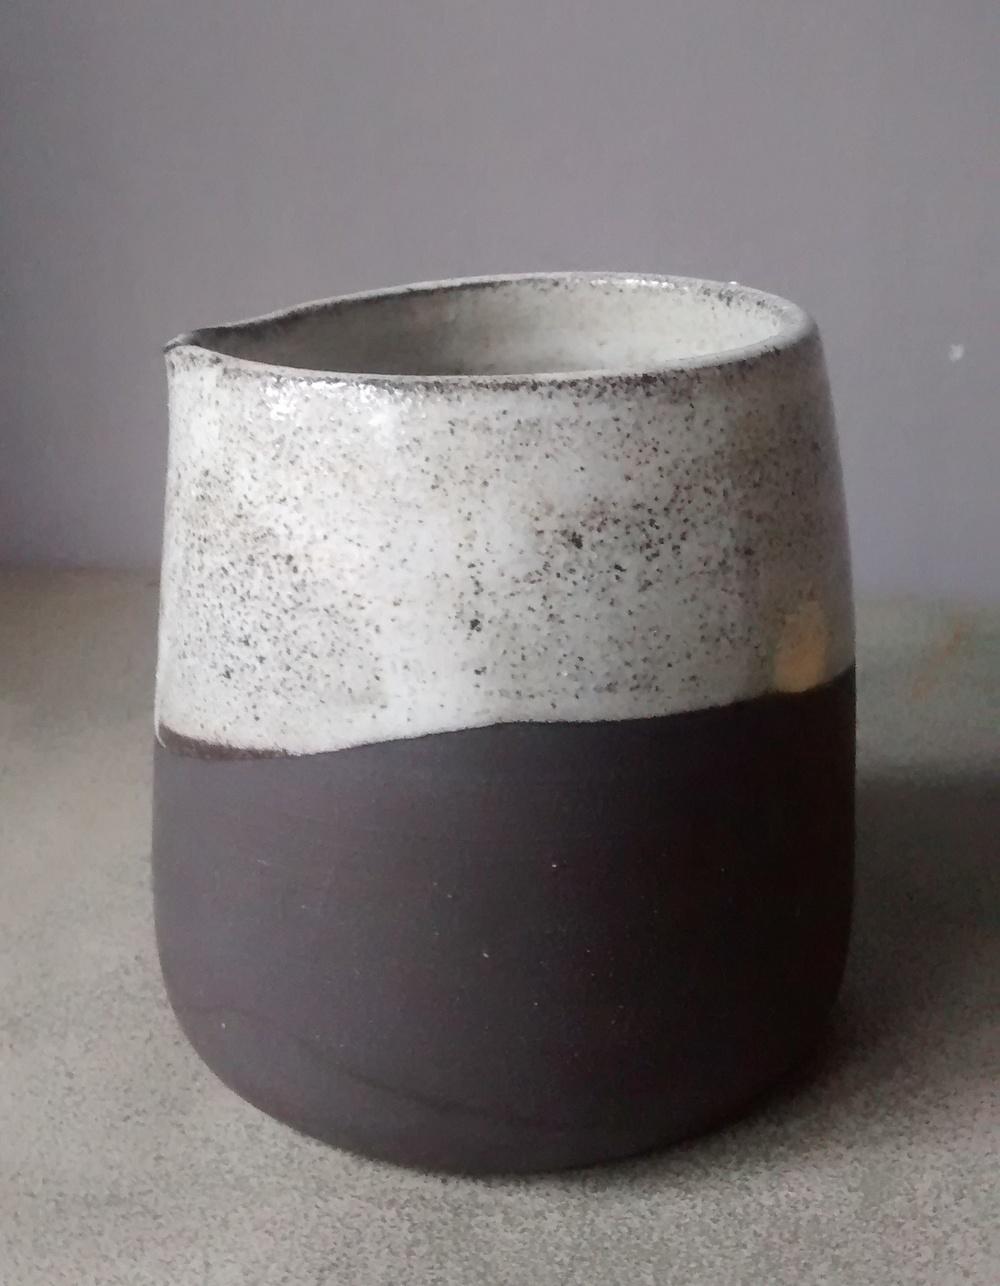 Katarina Dentschuk black jug.jpg